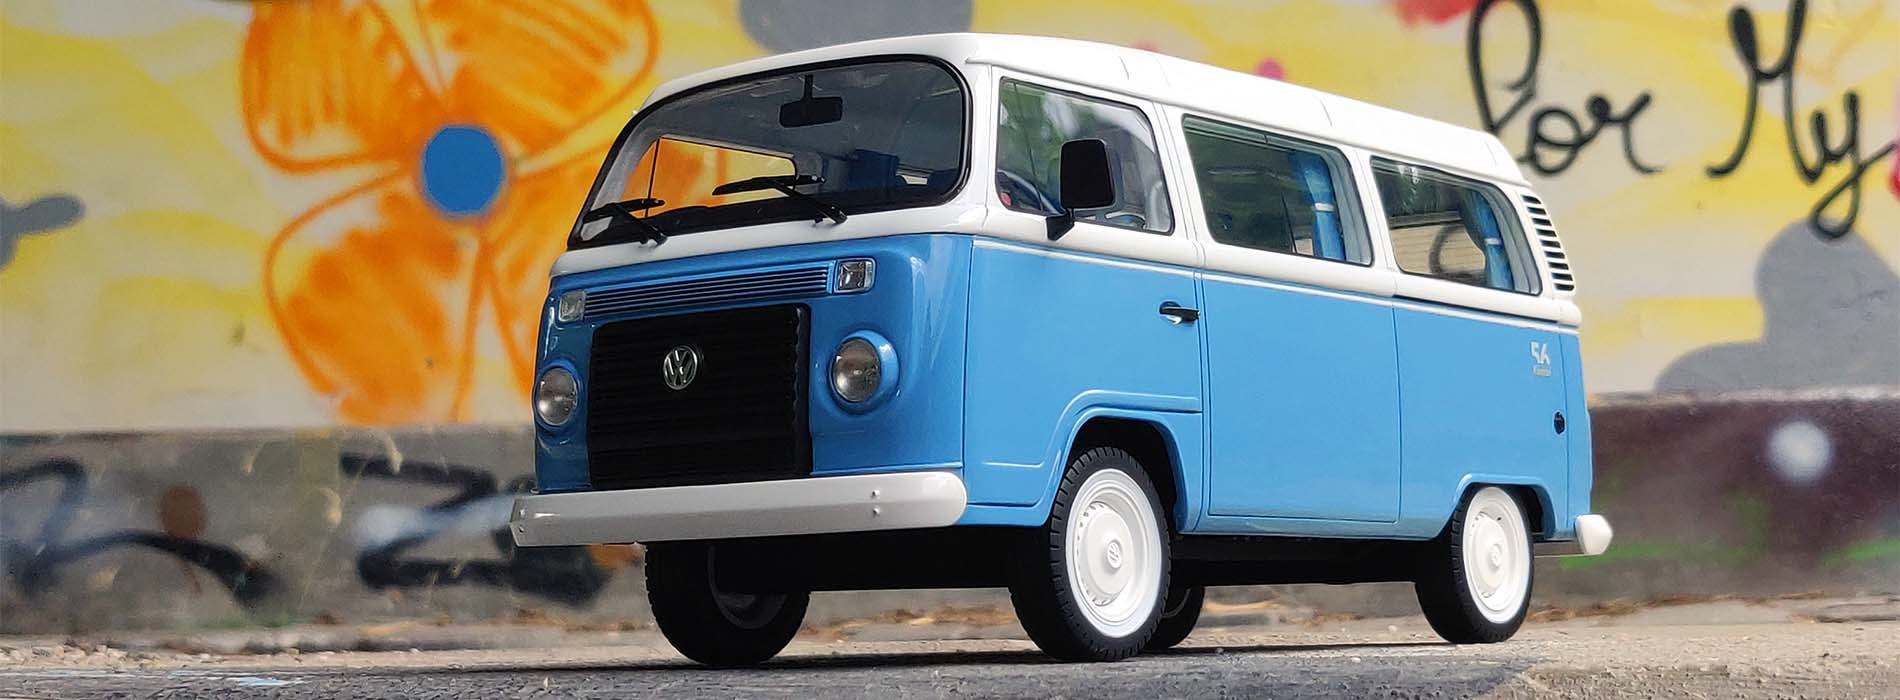 Volkswagen T2 Kombi Last Edition Brazil